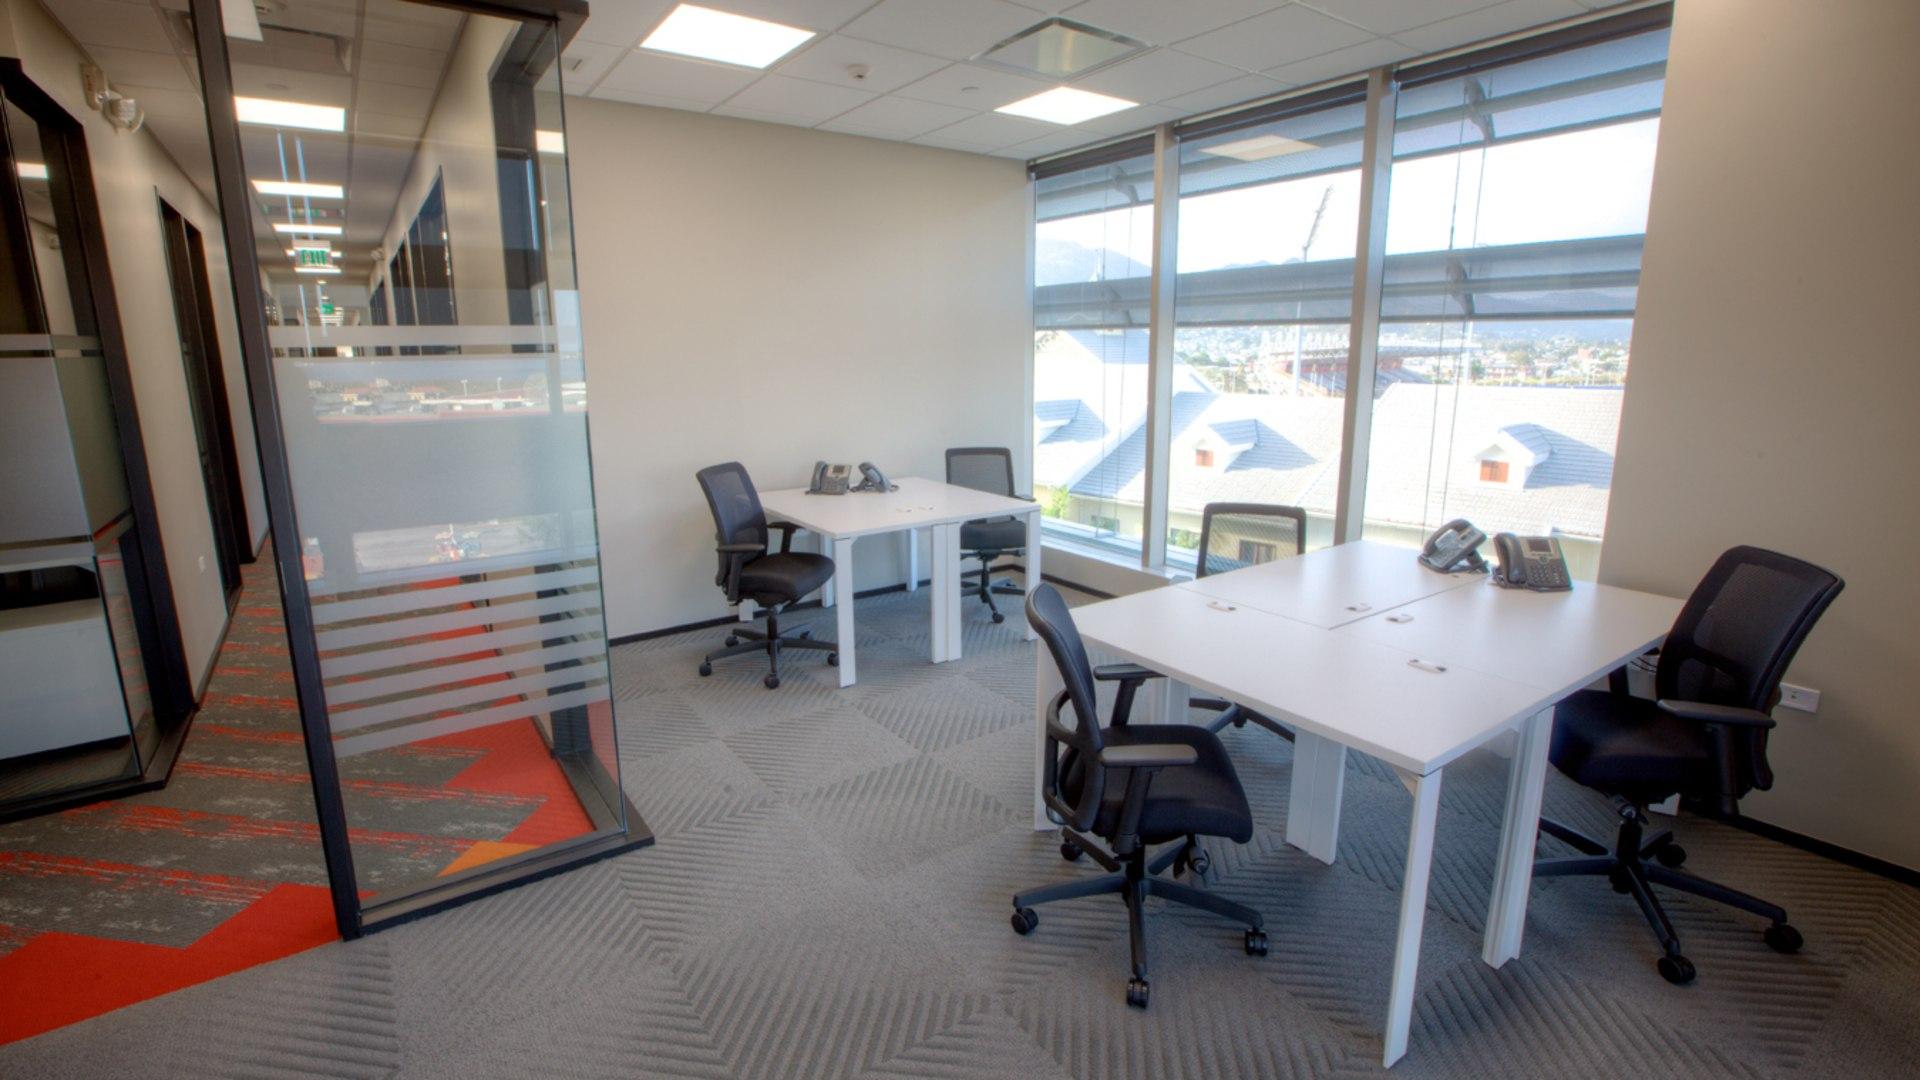 Regus Trinidad - Office - Property for Rental in Trinidad - Terra Caribbean